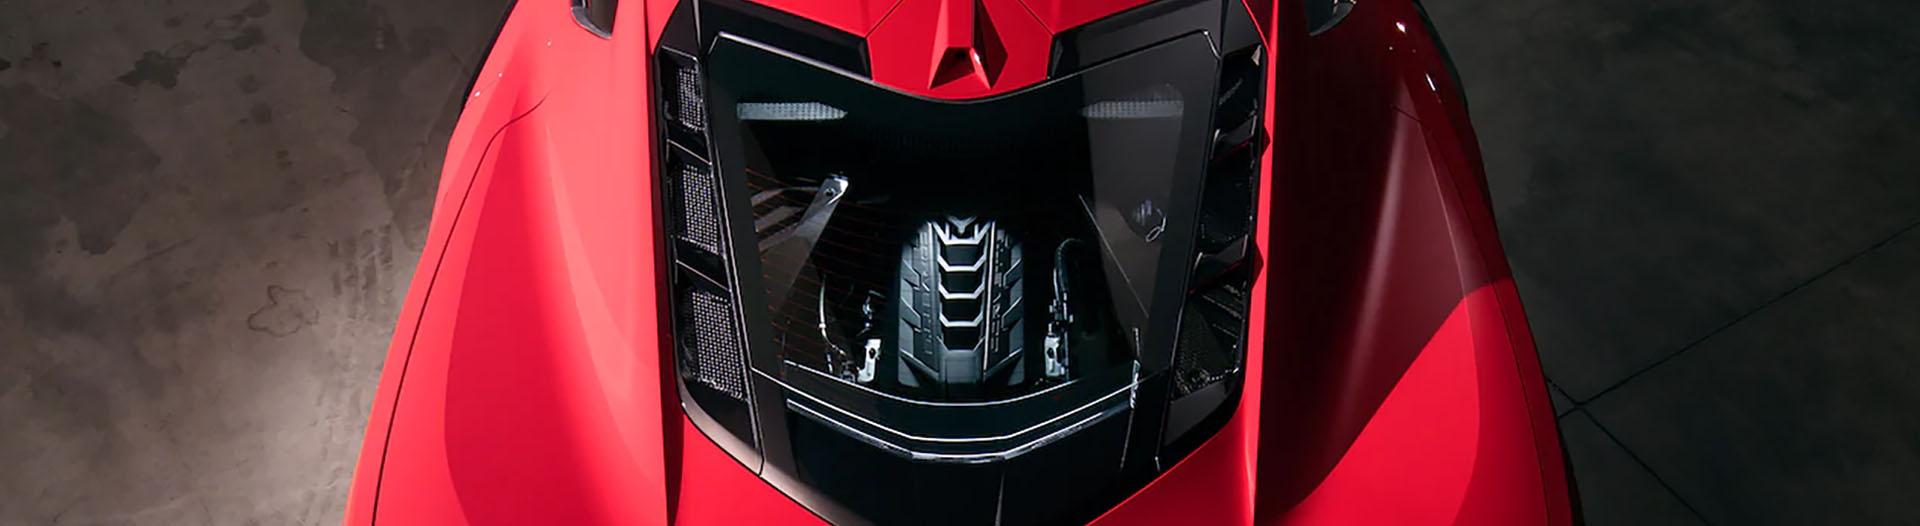 GMSV Corvette Engine